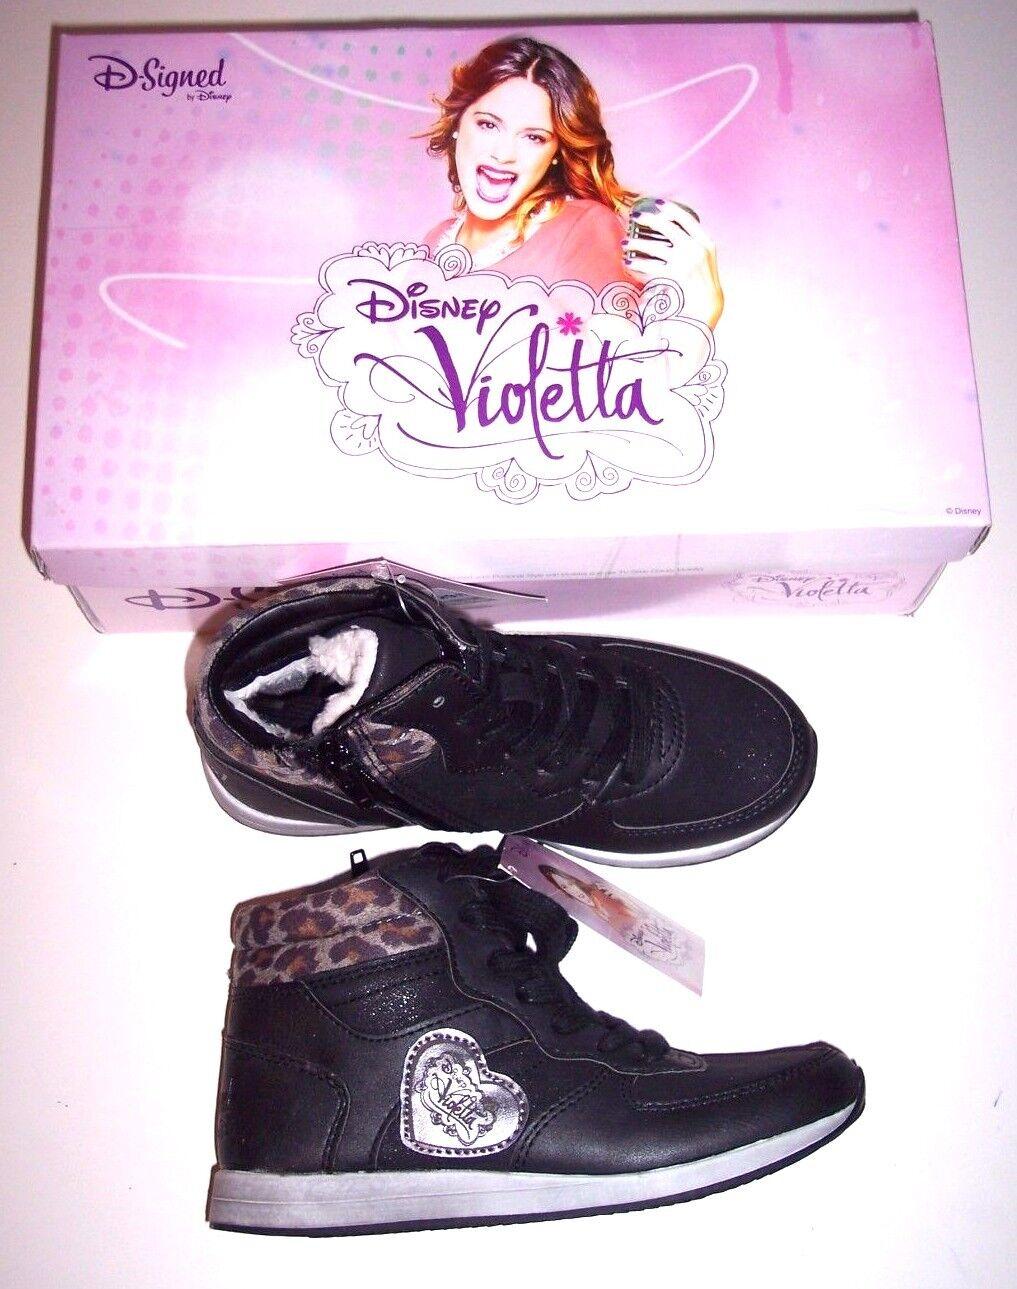 Disney Violetta Kinder Schuhe Knöchelhoch Turnschuhe Gr. 31  gefüttert